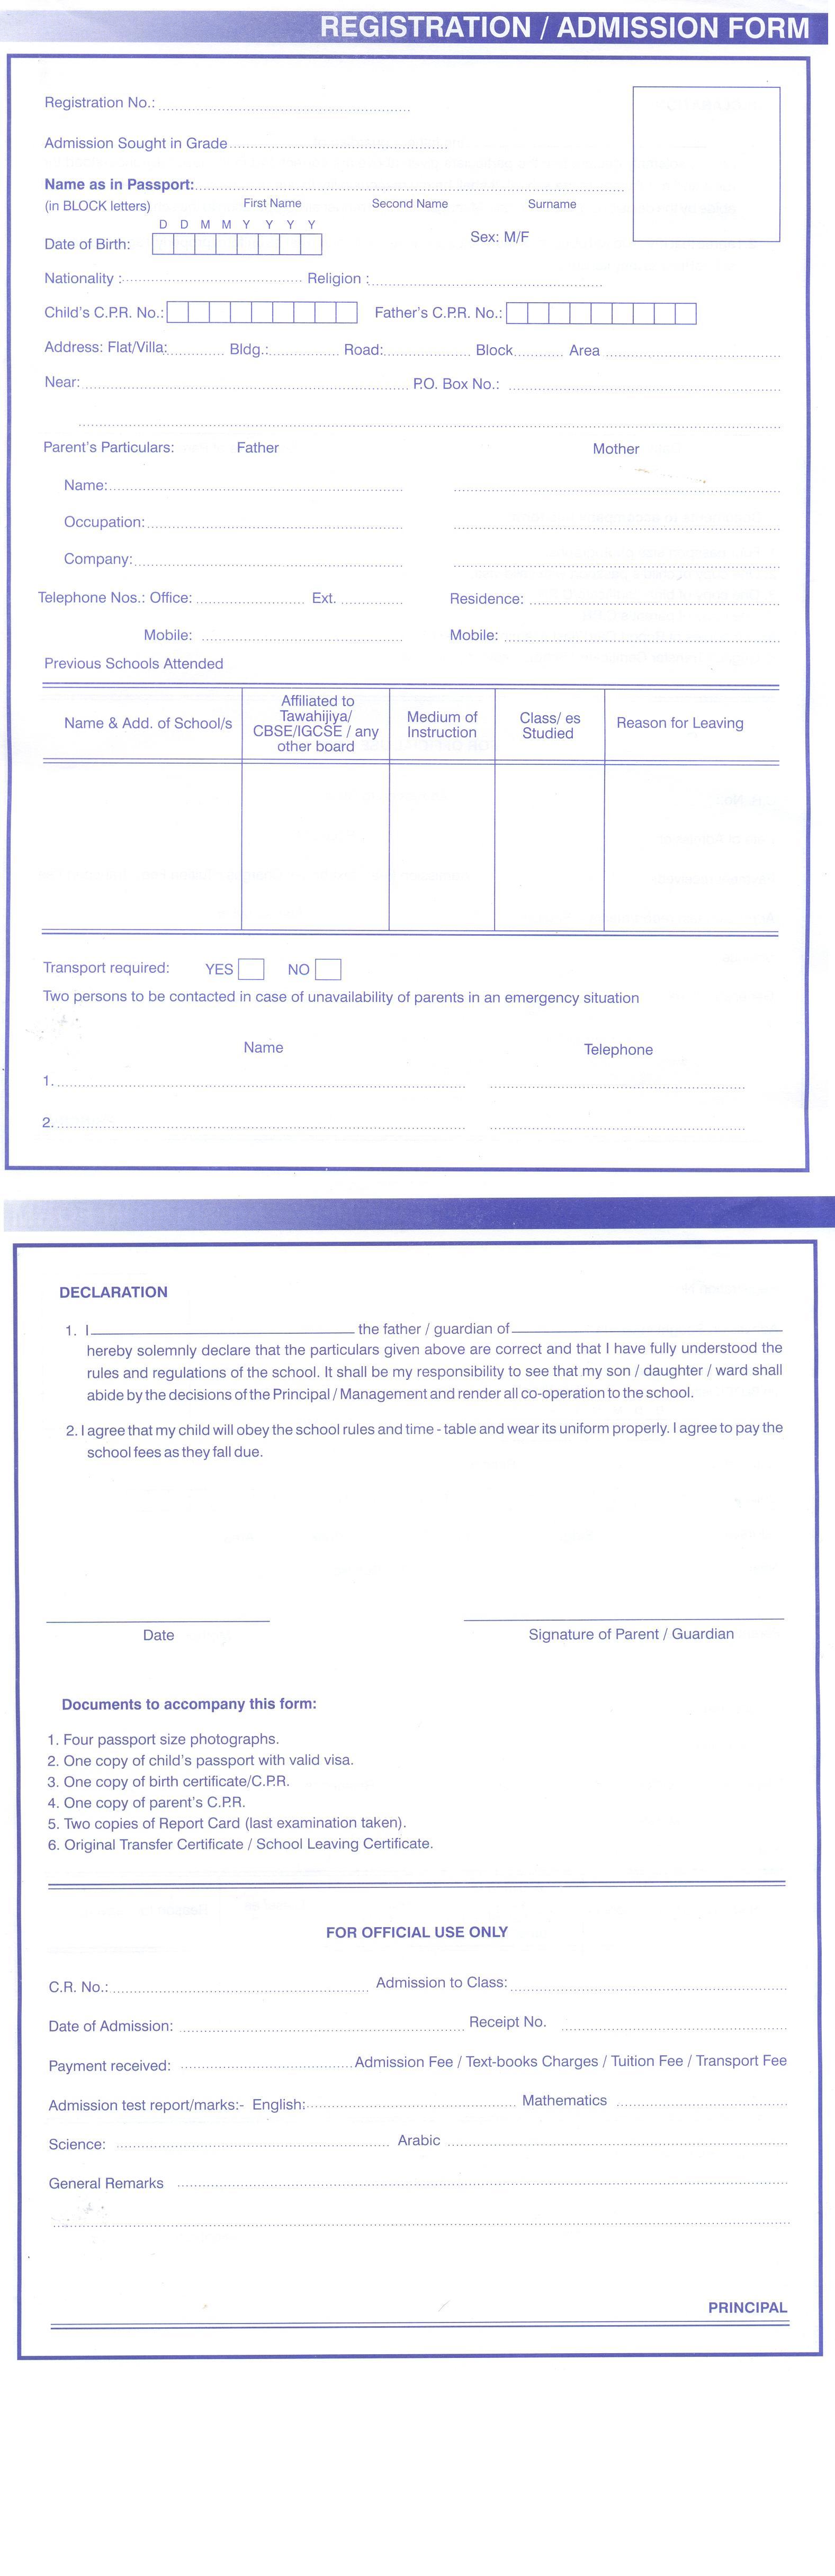 Admission Al mahd Day Boarding School Kingdom of bahrain – Medical Certificate for School